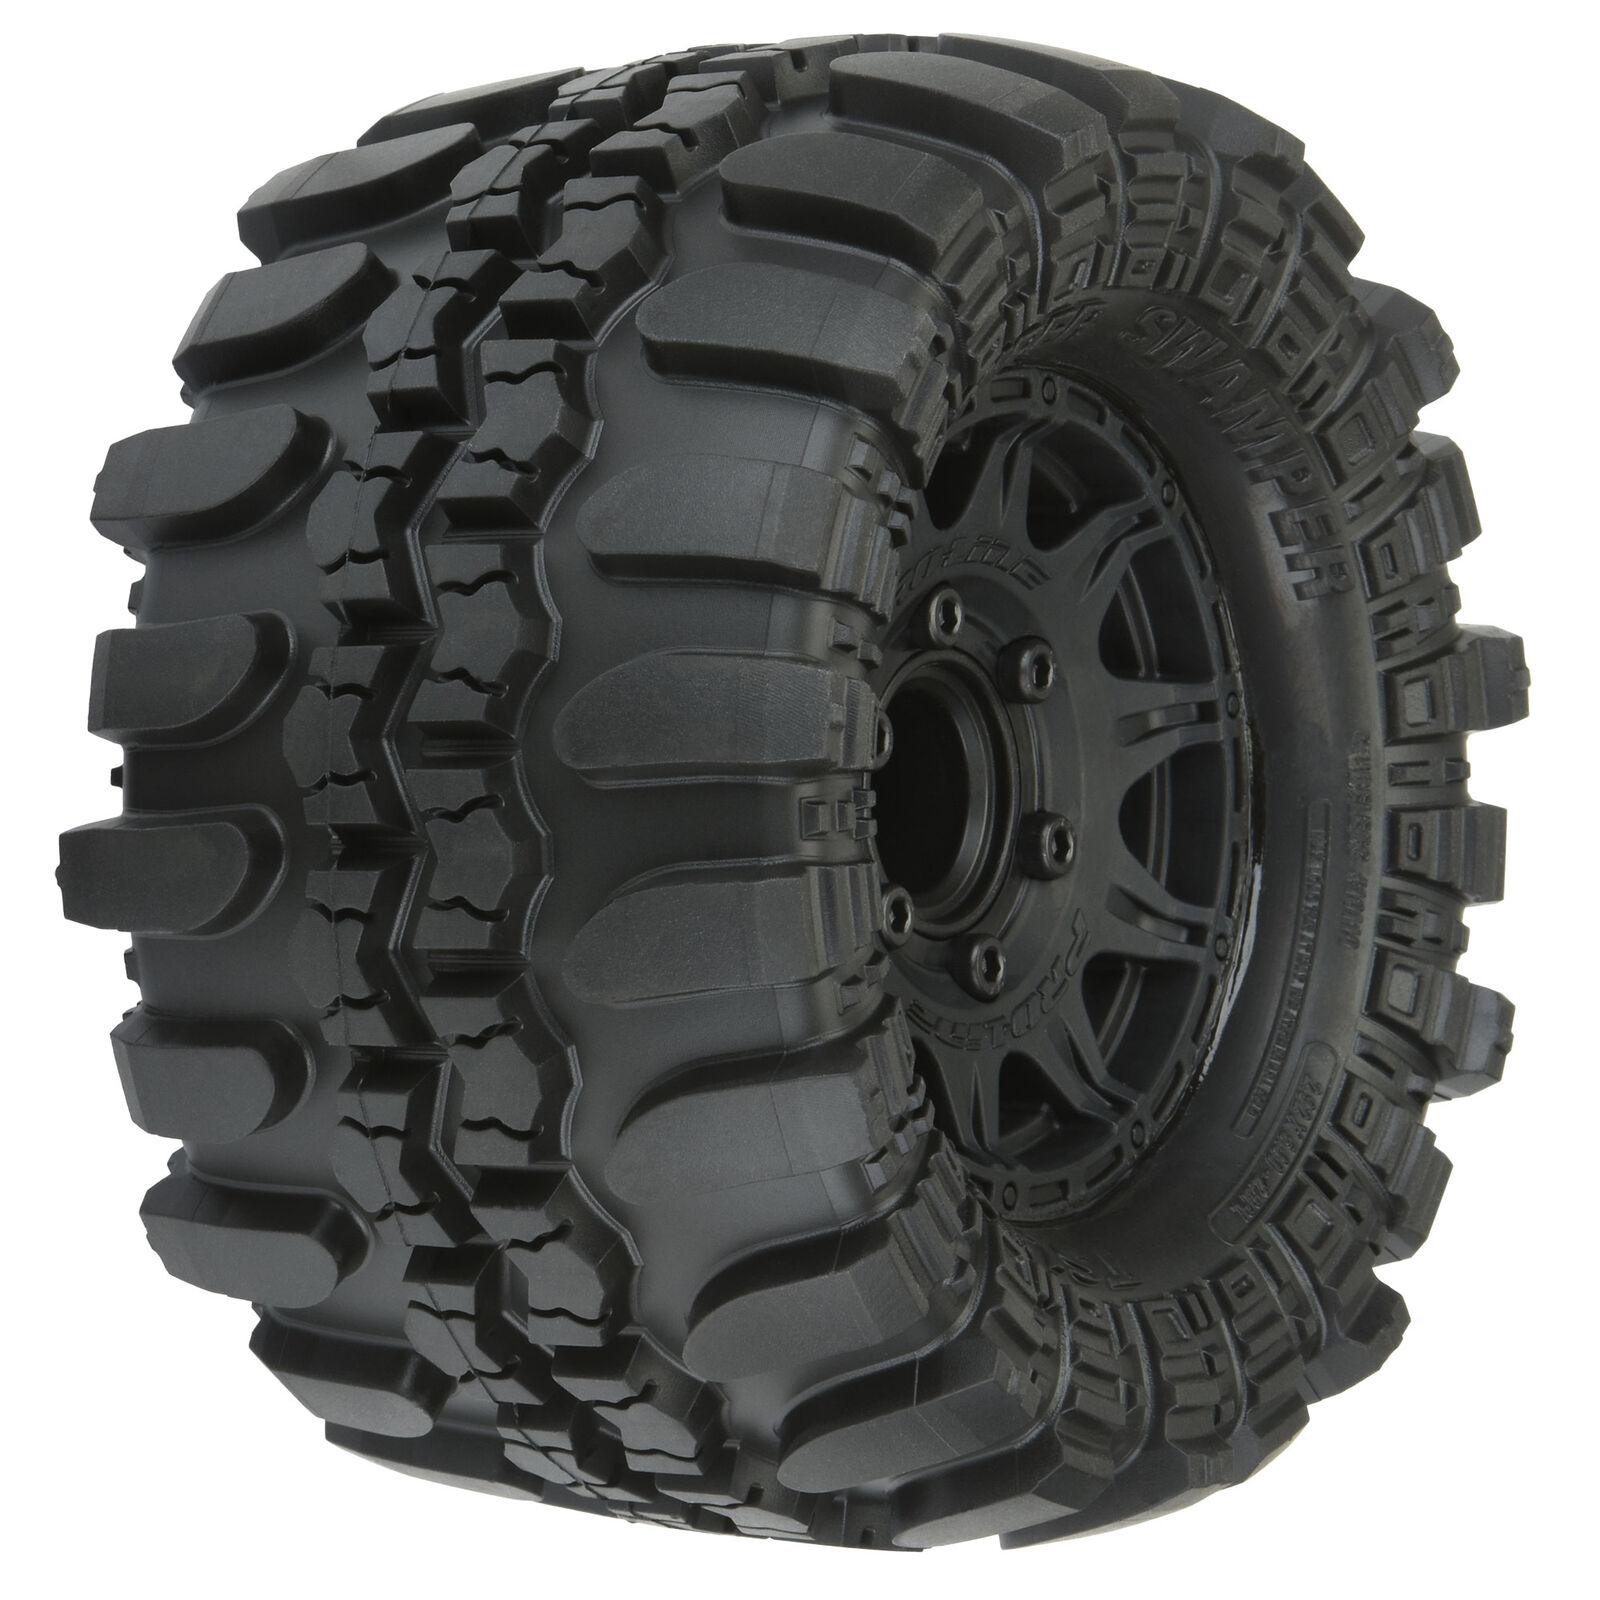 "1/10 Interco Supr Swmpr F/R 2.8"" MT Tires Mounted 12mm Blk Raid (2)"